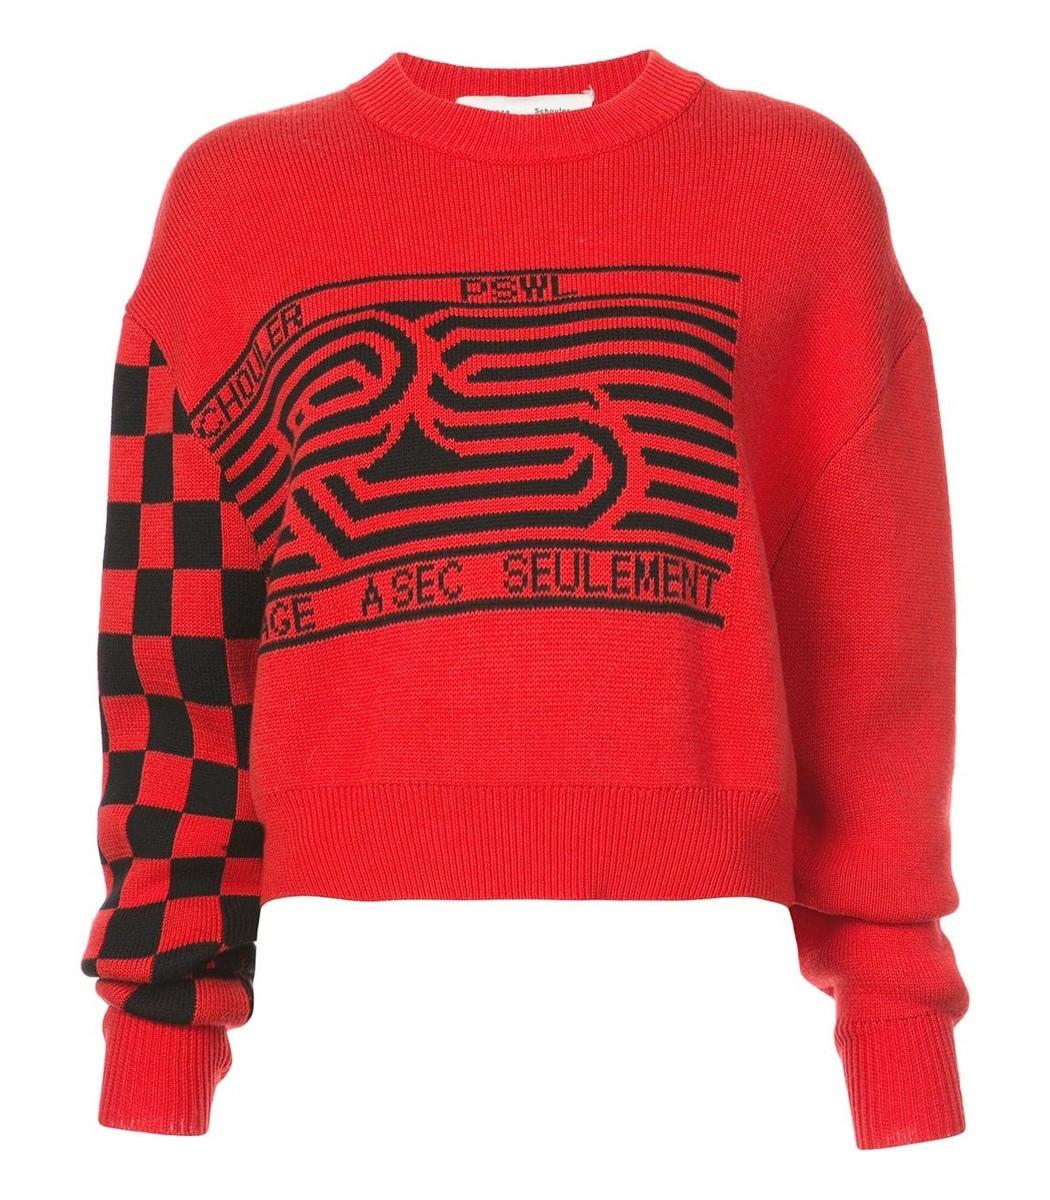 Proenza Schouler Checkerboard Sweater Pswl Shopbazaar wON8XZ0Pkn